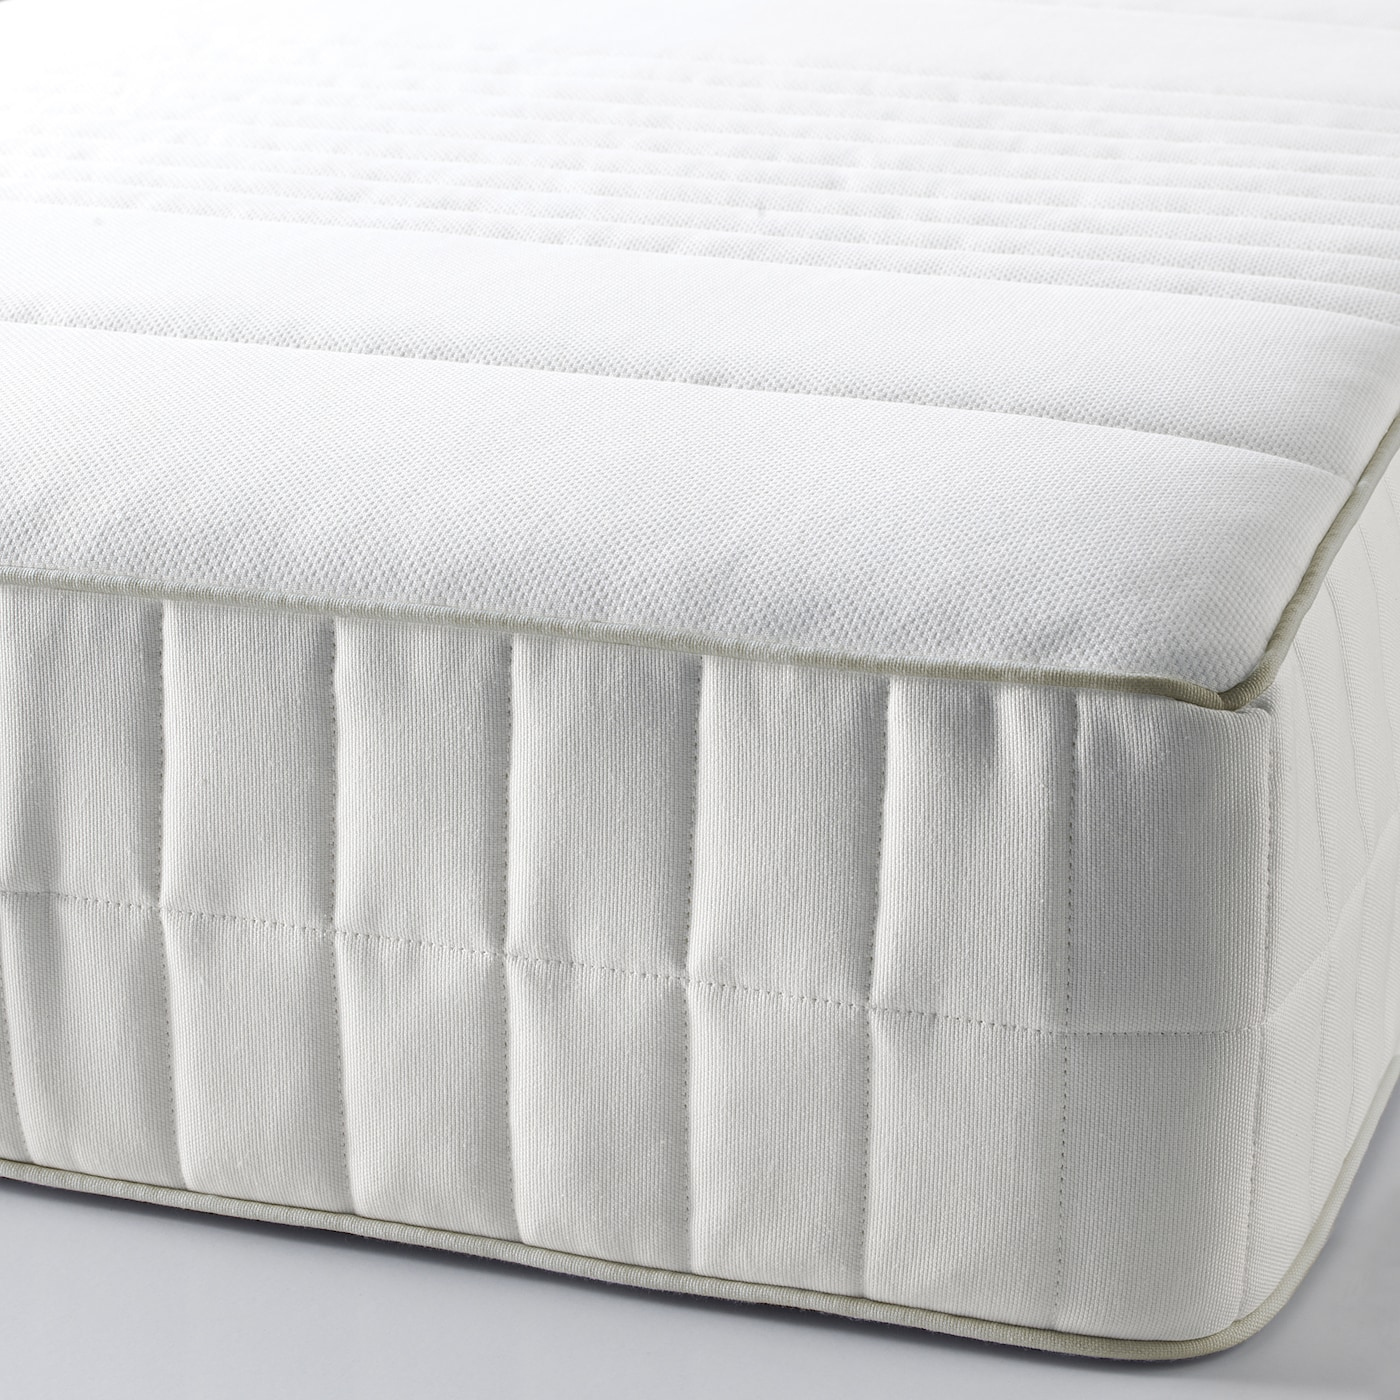 Myrbacka Materasso In Memory Foam Rigido Bianco 160x190 Cm Ikea It